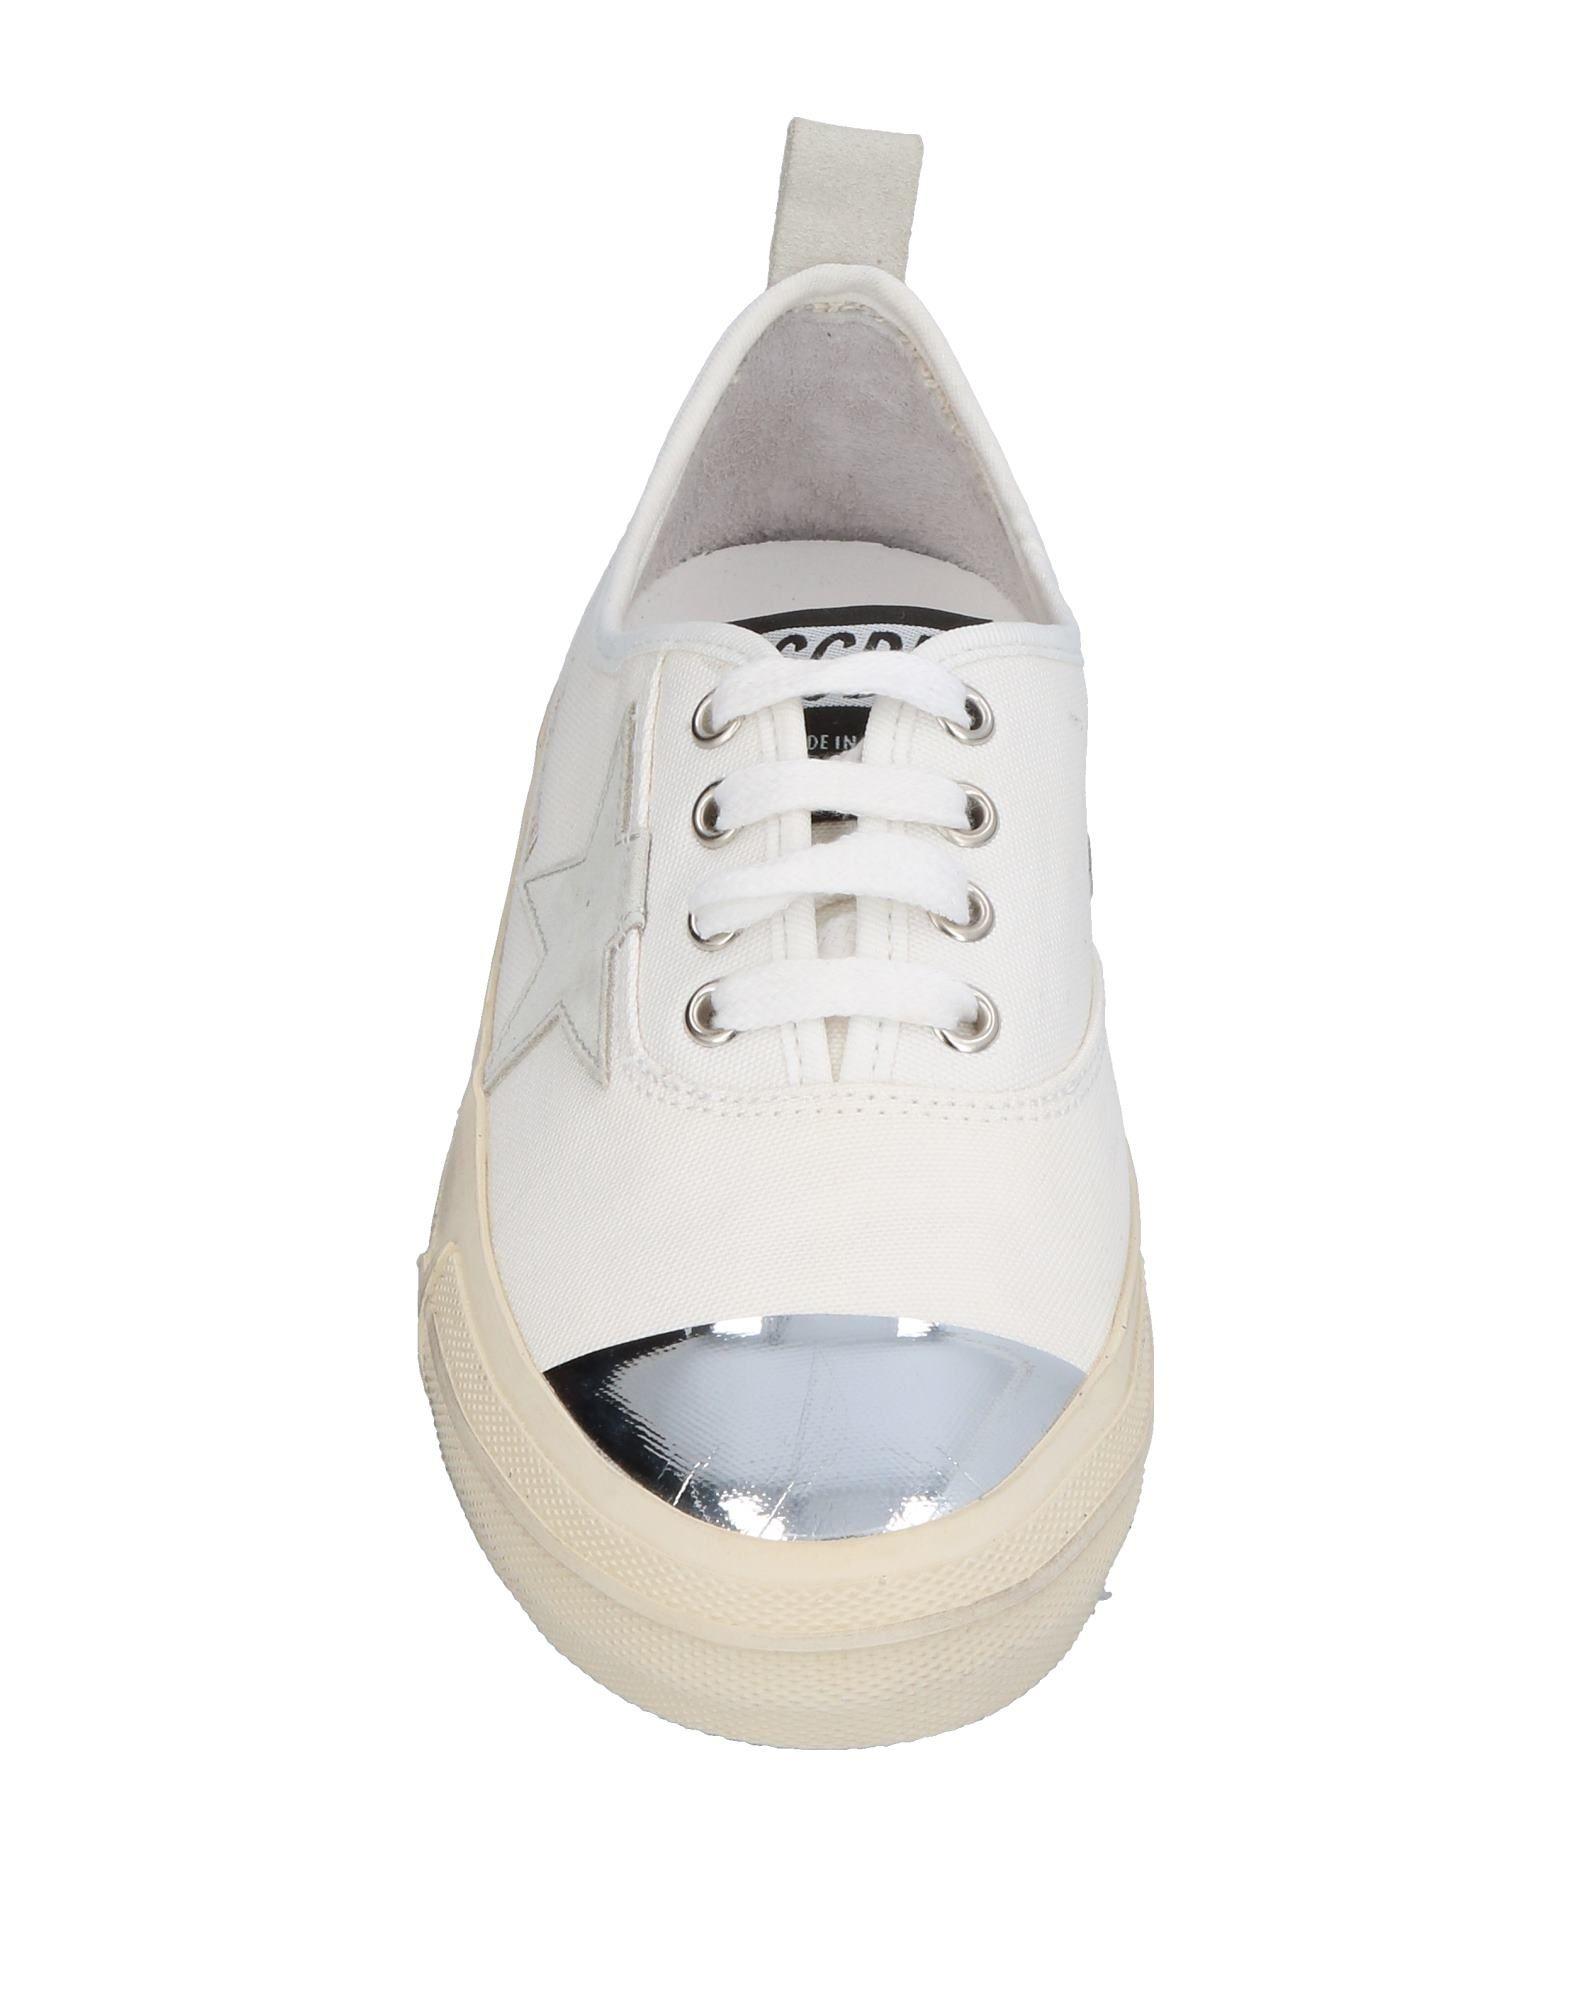 Golden Goose Deluxe Brand Sneakers Damen  11382356LPGut aussehende strapazierfähige Schuhe